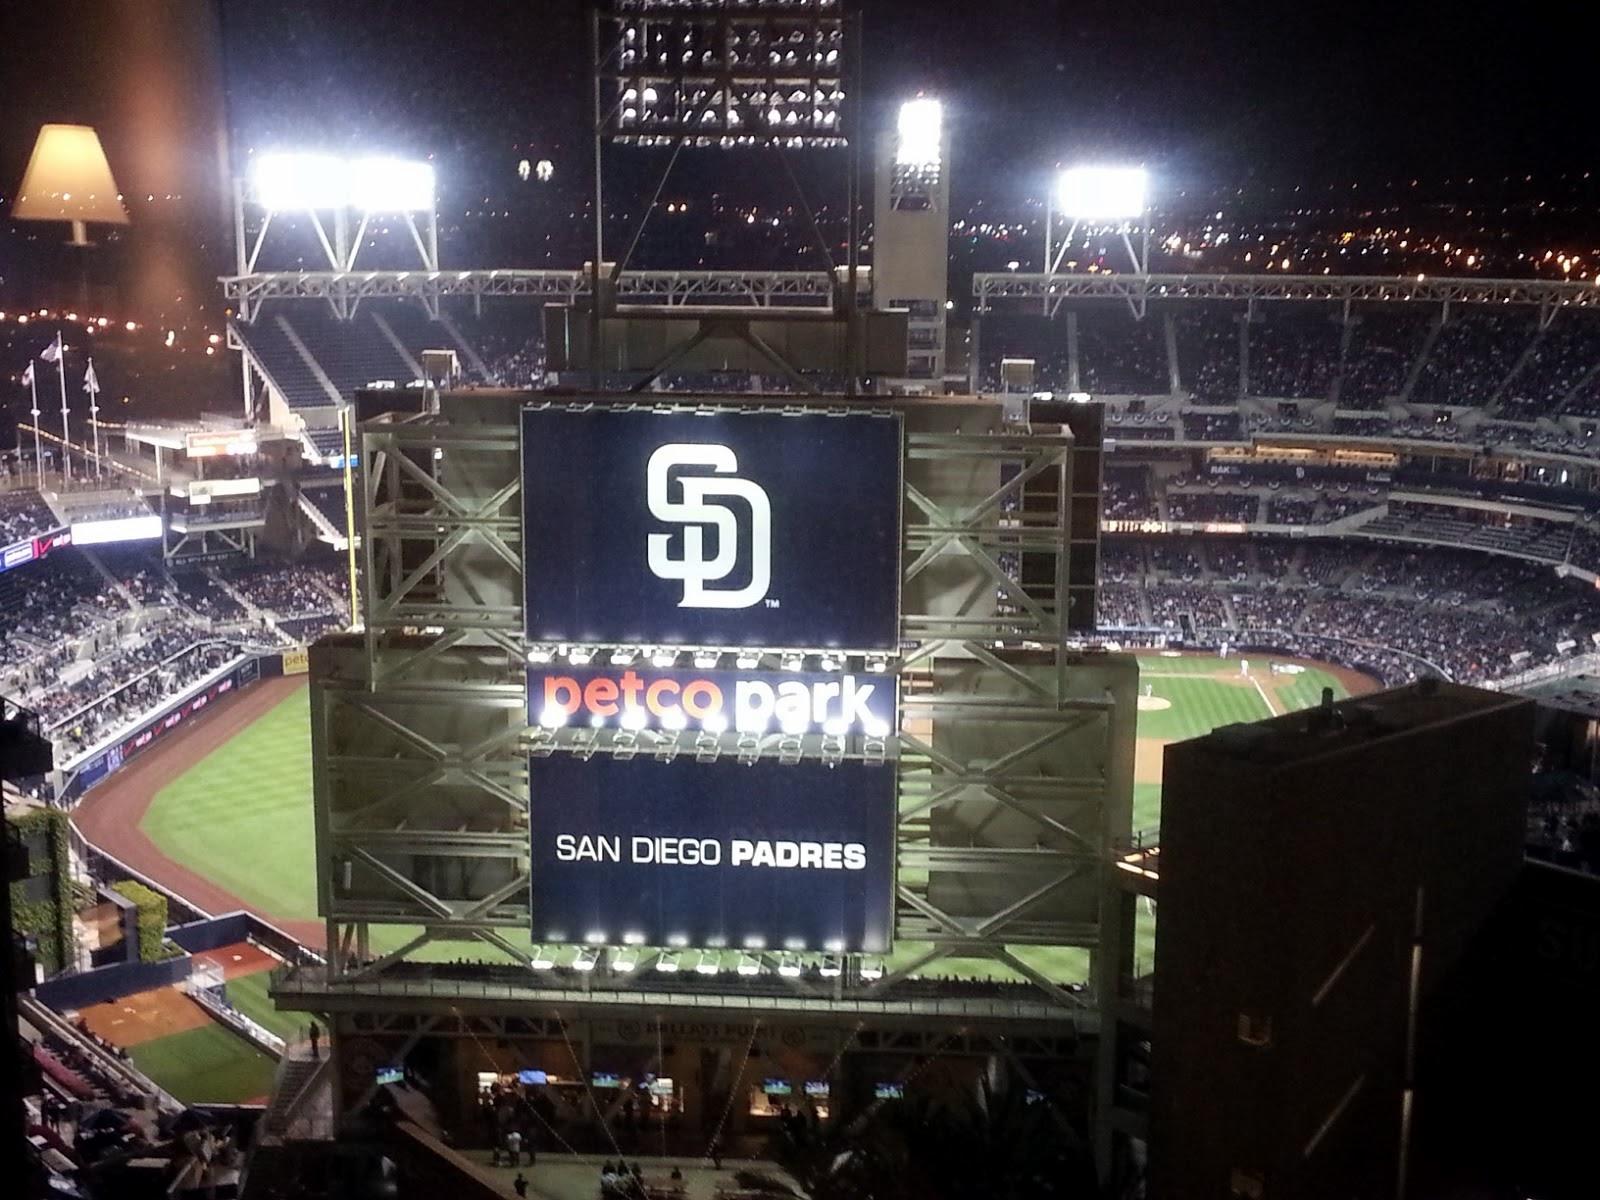 SAN DIEGO PADRES mlb baseball 25 wallpaper 1600x1200 231841 1600x1200